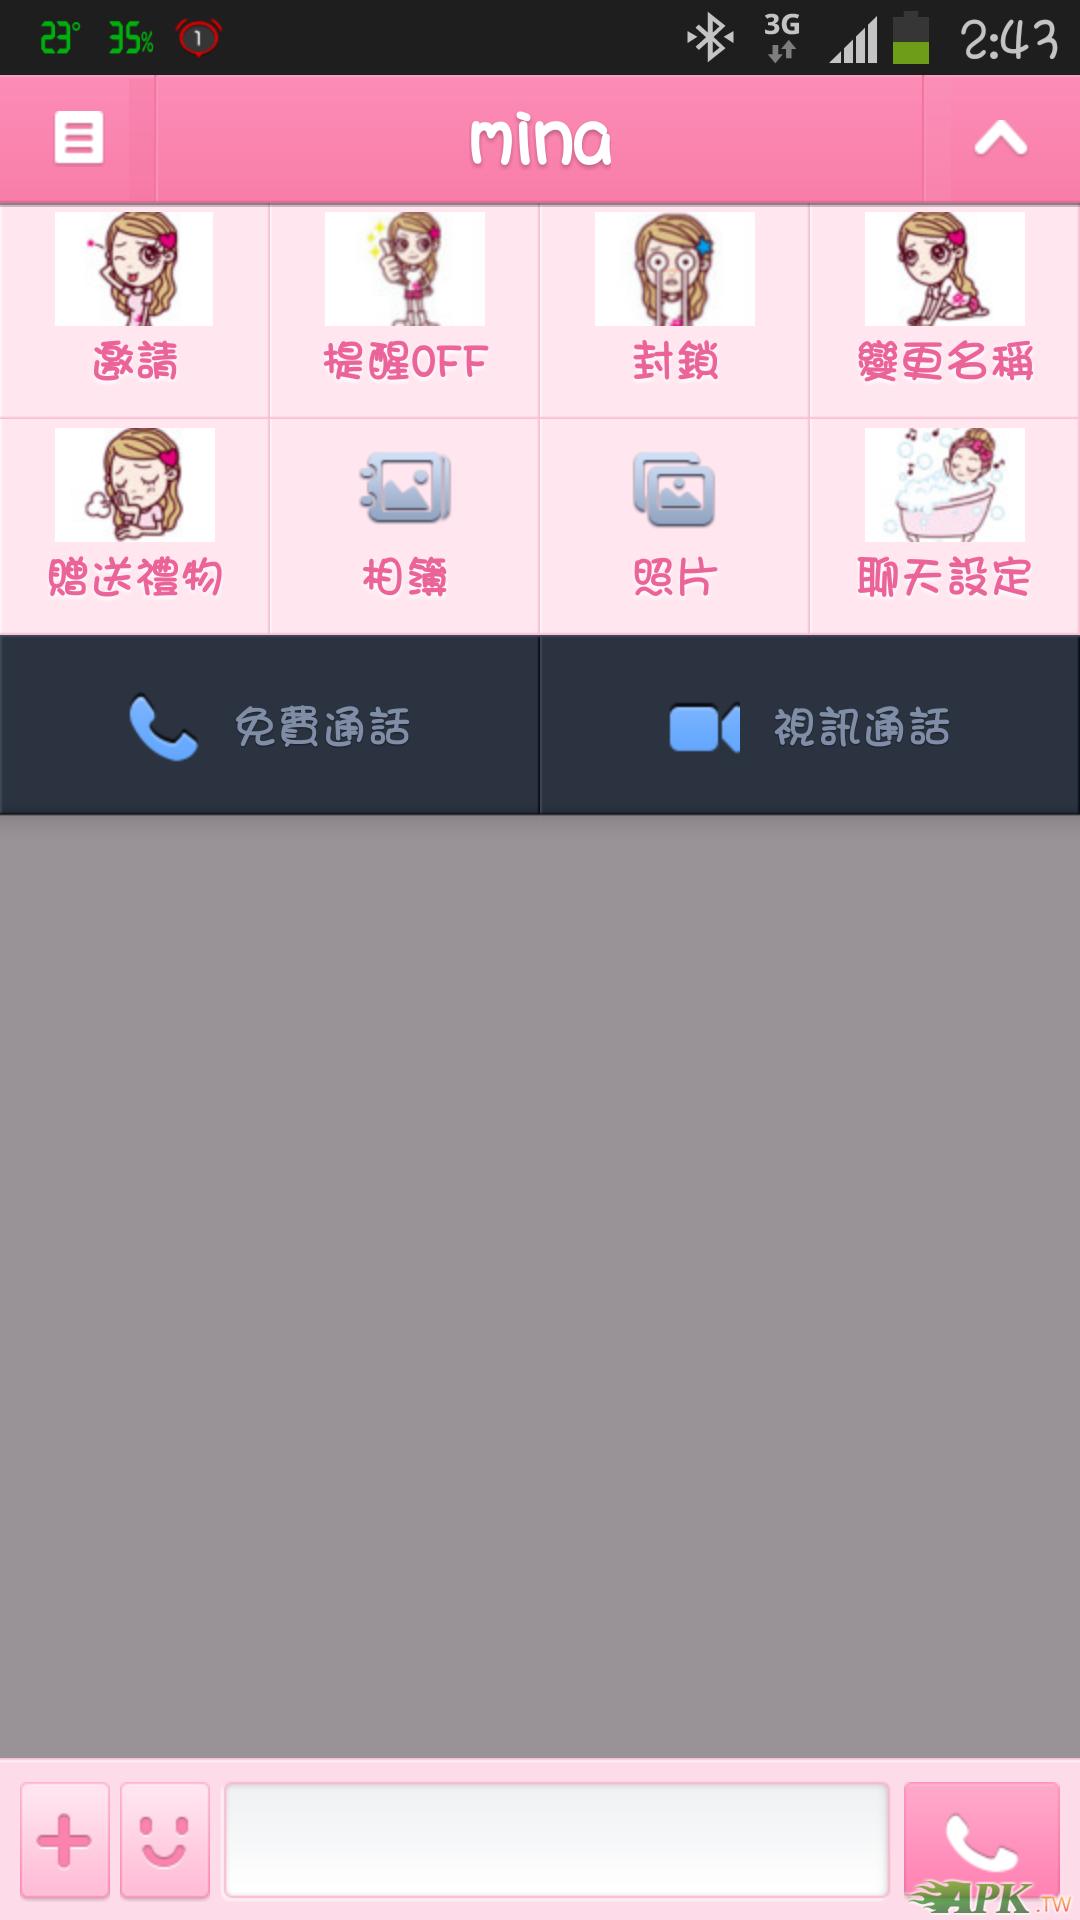 Screenshot_2013-12-27-02-43-16[1].png